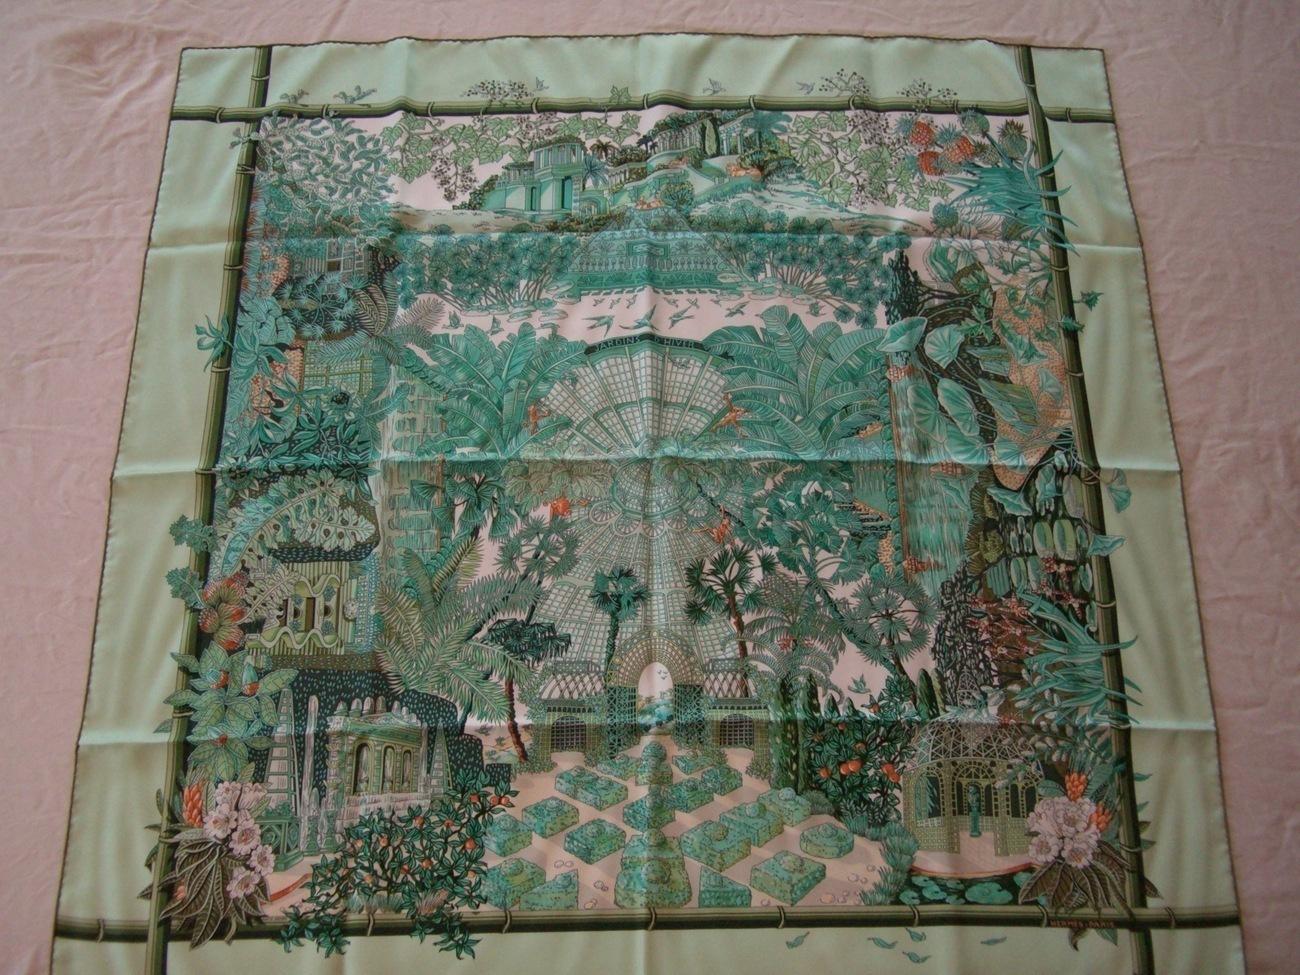 Hermes scarf jardins d 39 hiver green pattern print - Jardins dhiver com ...